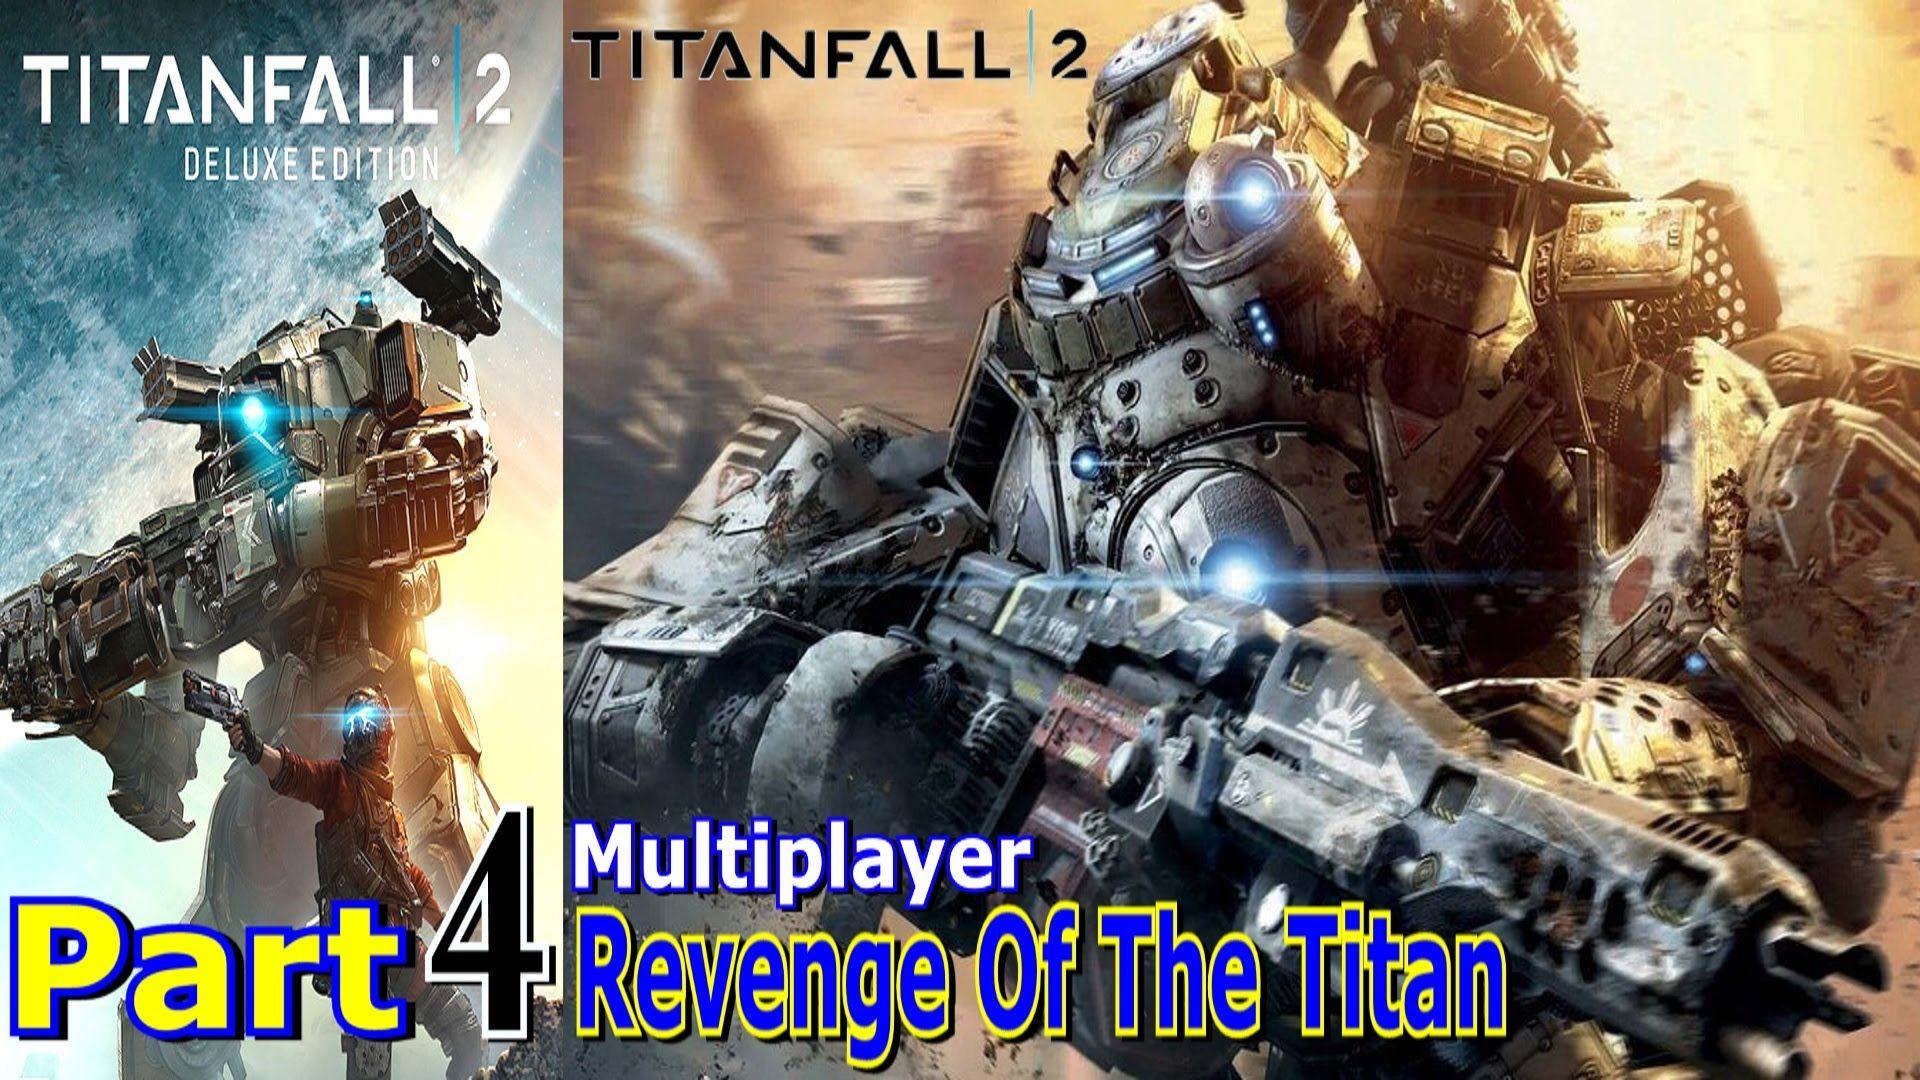 revenge of the titan titanfall 2 multiplayer part 4 gameplay